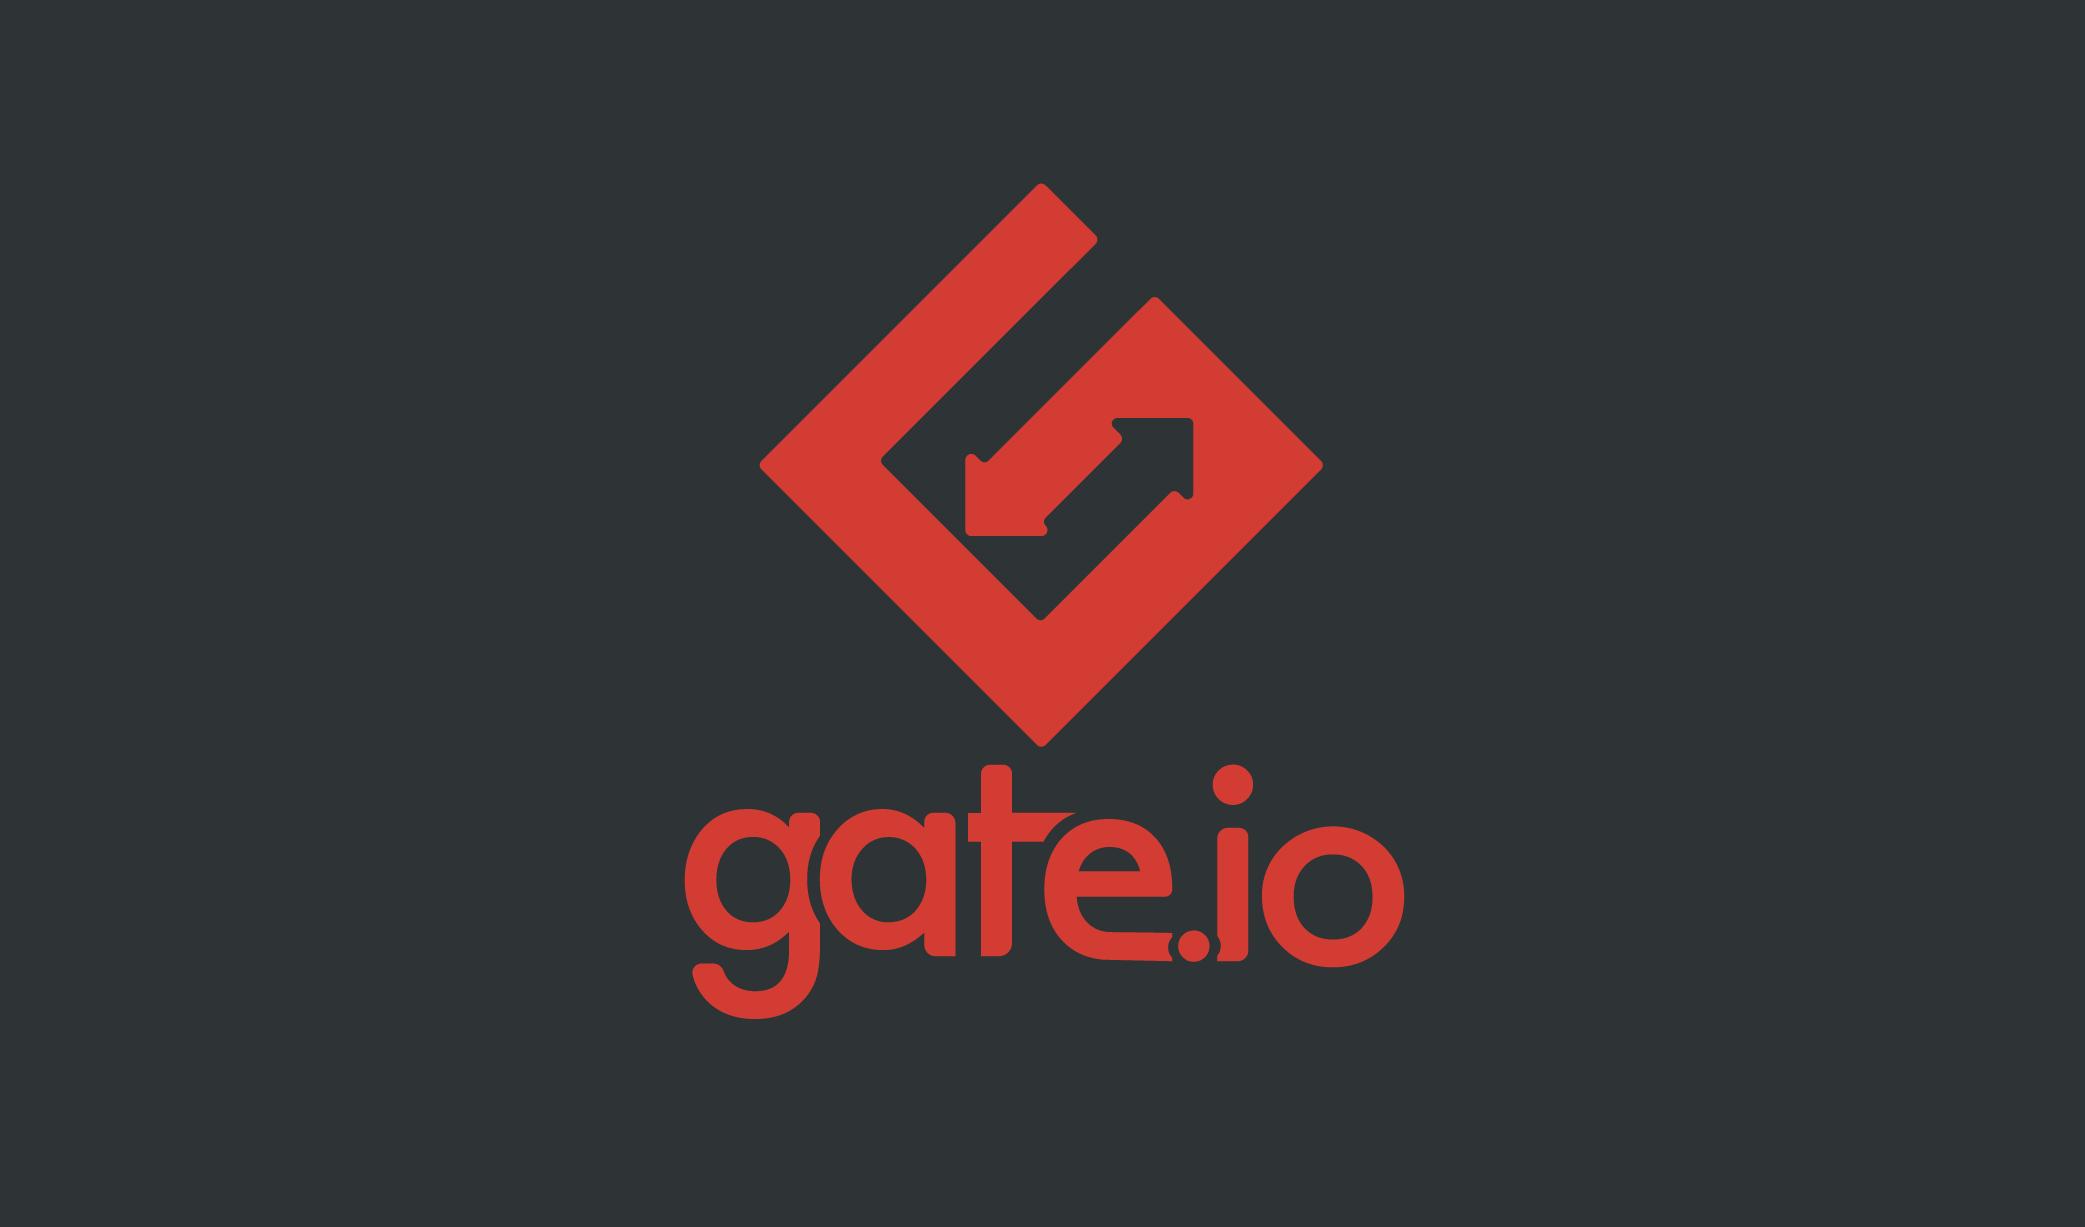 gate.io automated trading